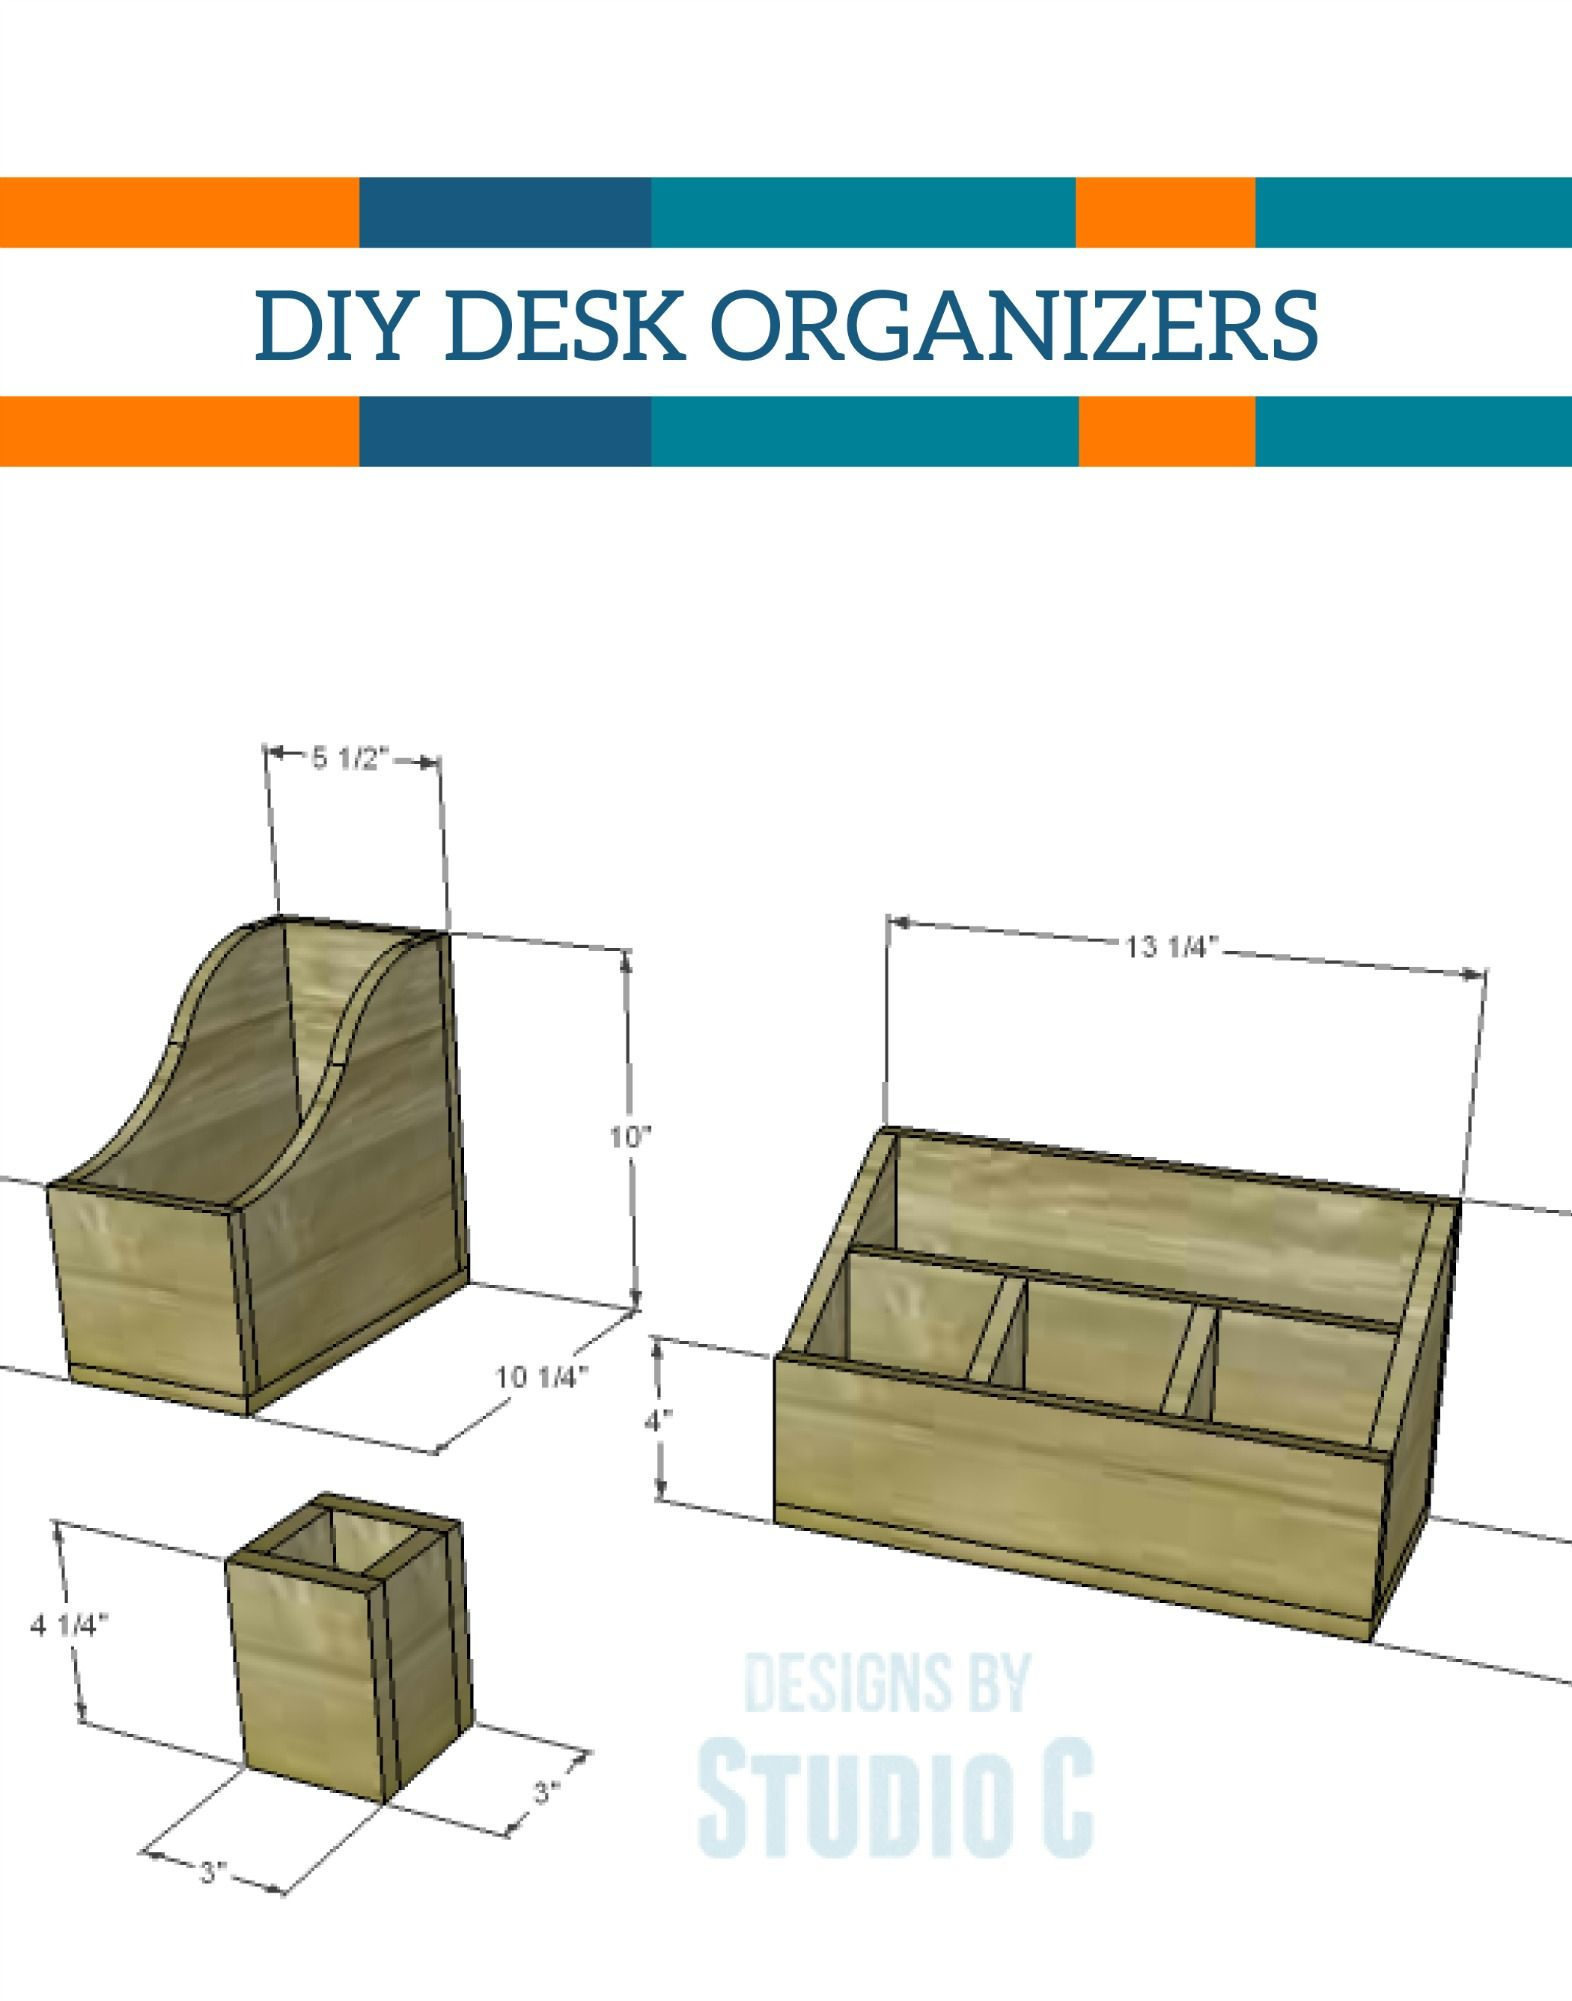 Organize A Desk With Easy To Build Caddies Desk Organization Diy